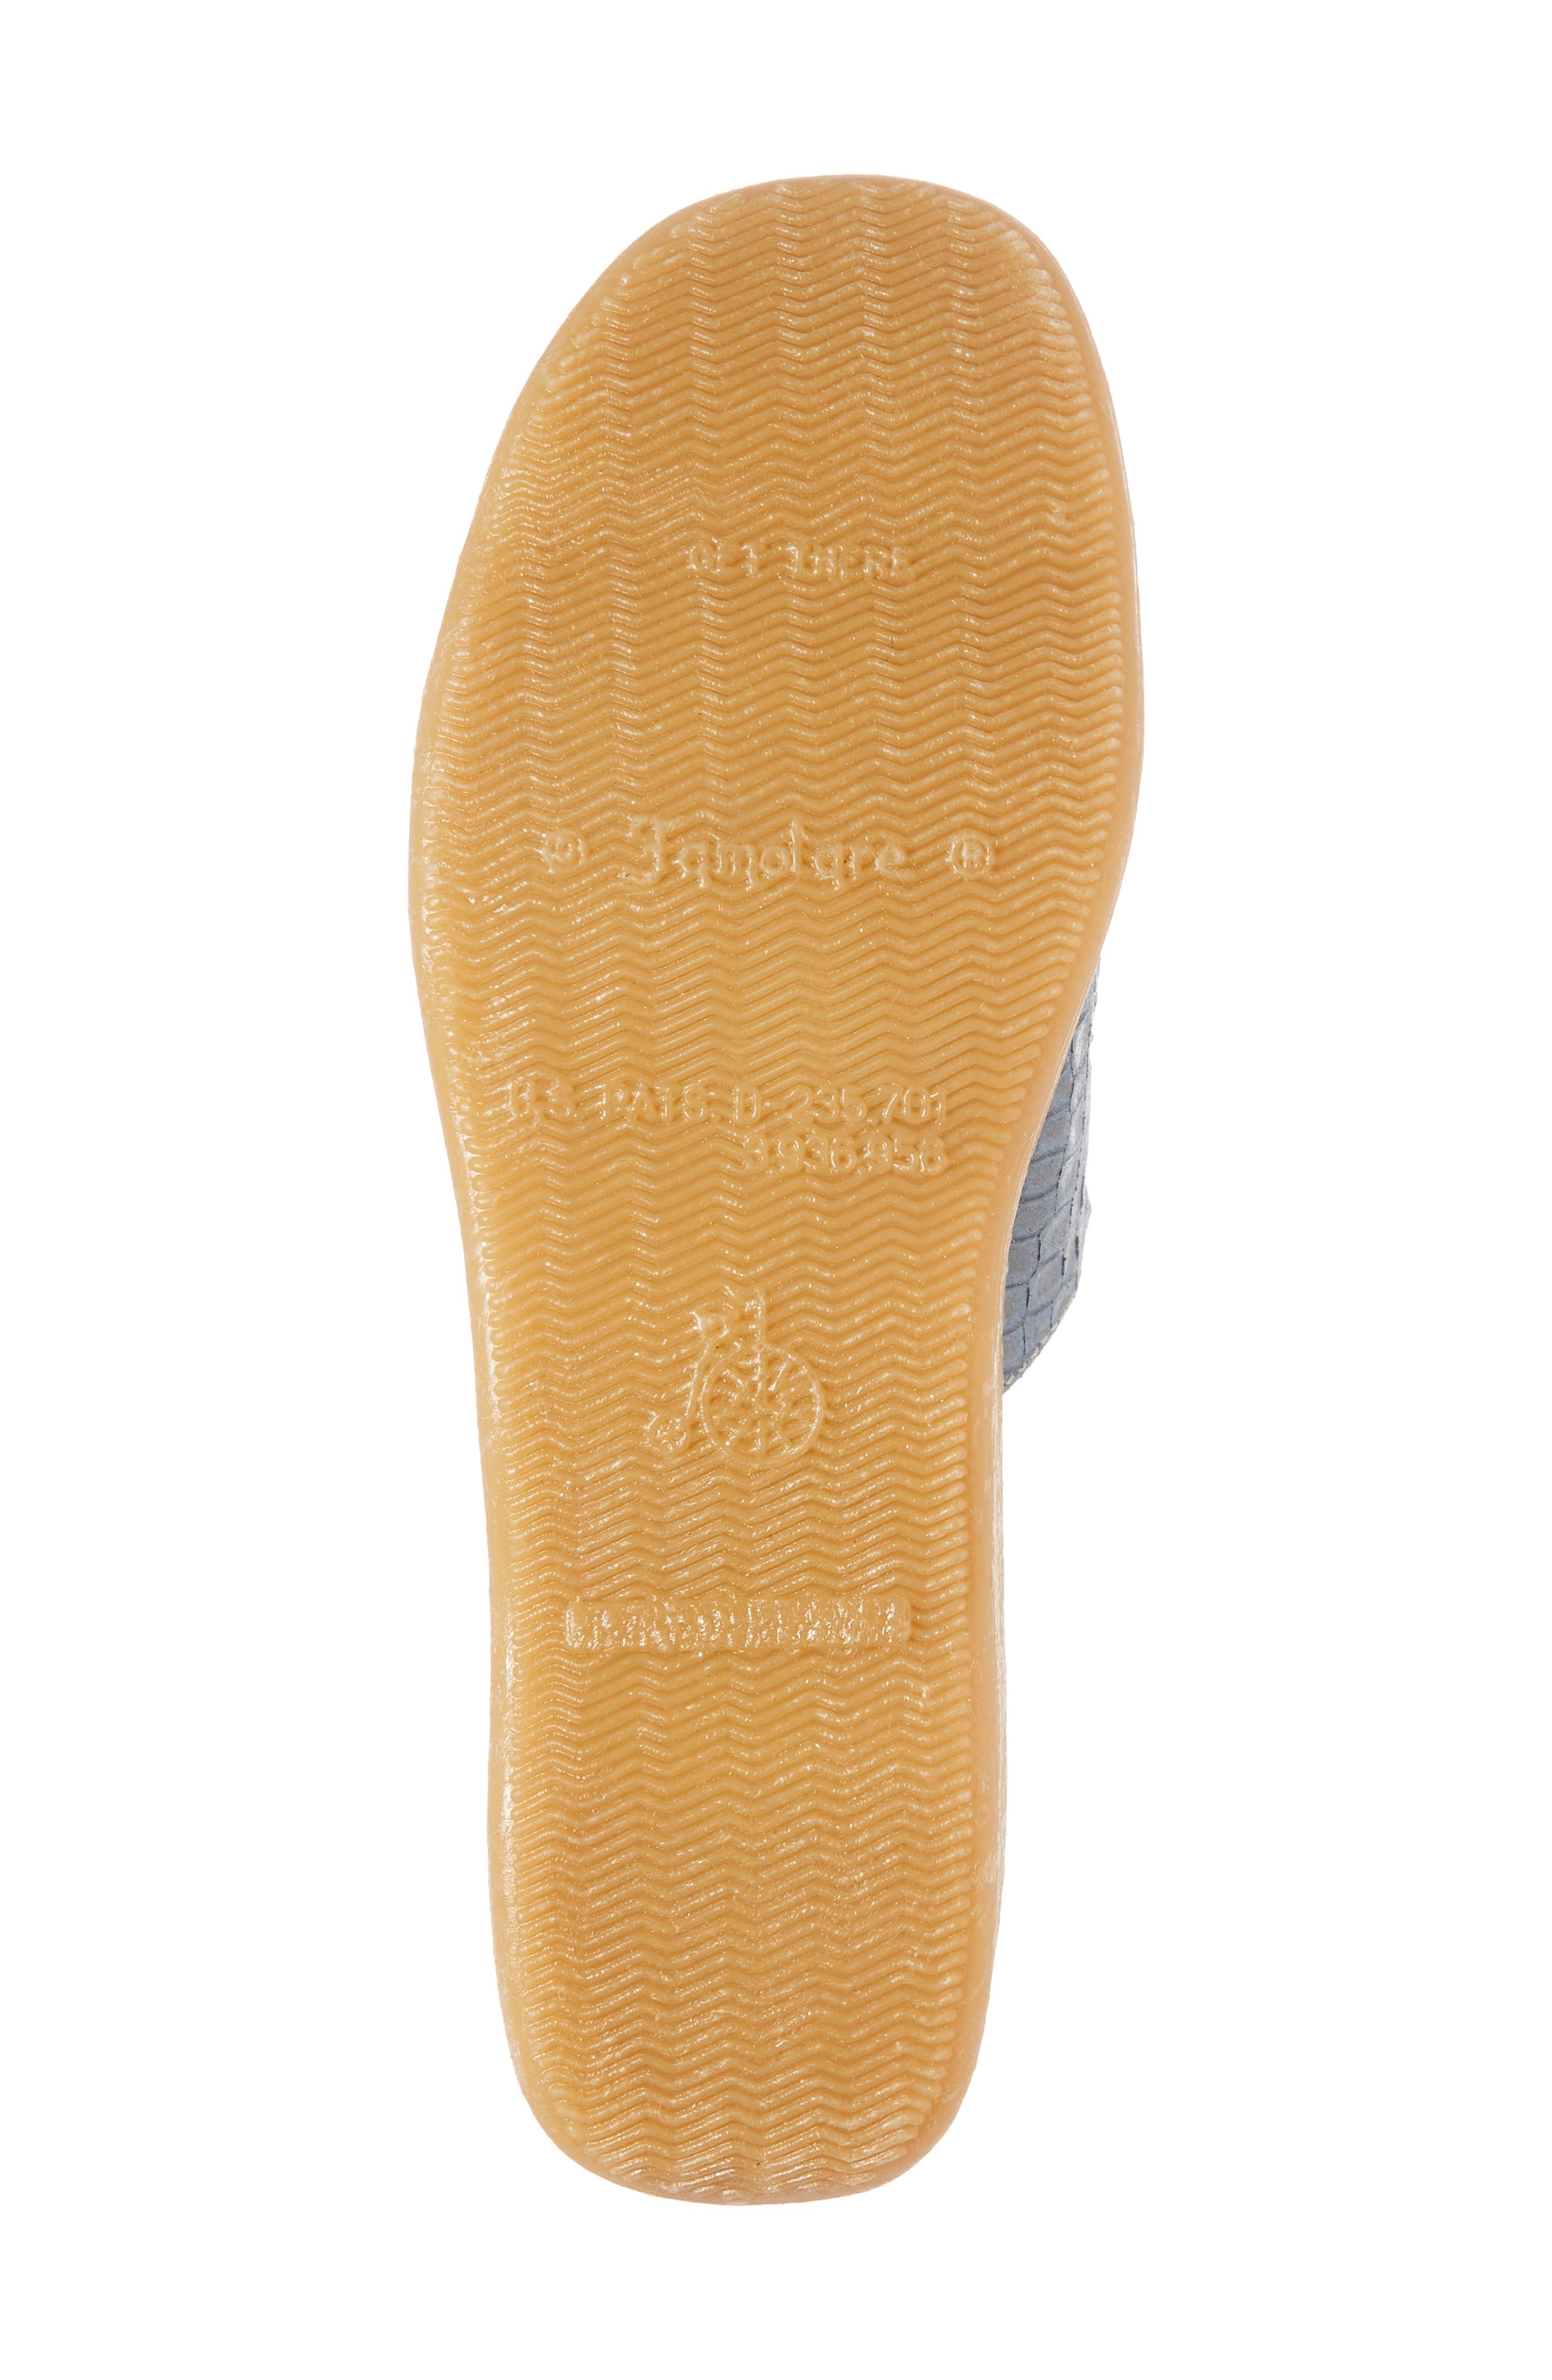 Slide N Sleek Wedge Slide Sandal,                             Alternate thumbnail 6, color,                             Aqua Croc Printed Leather